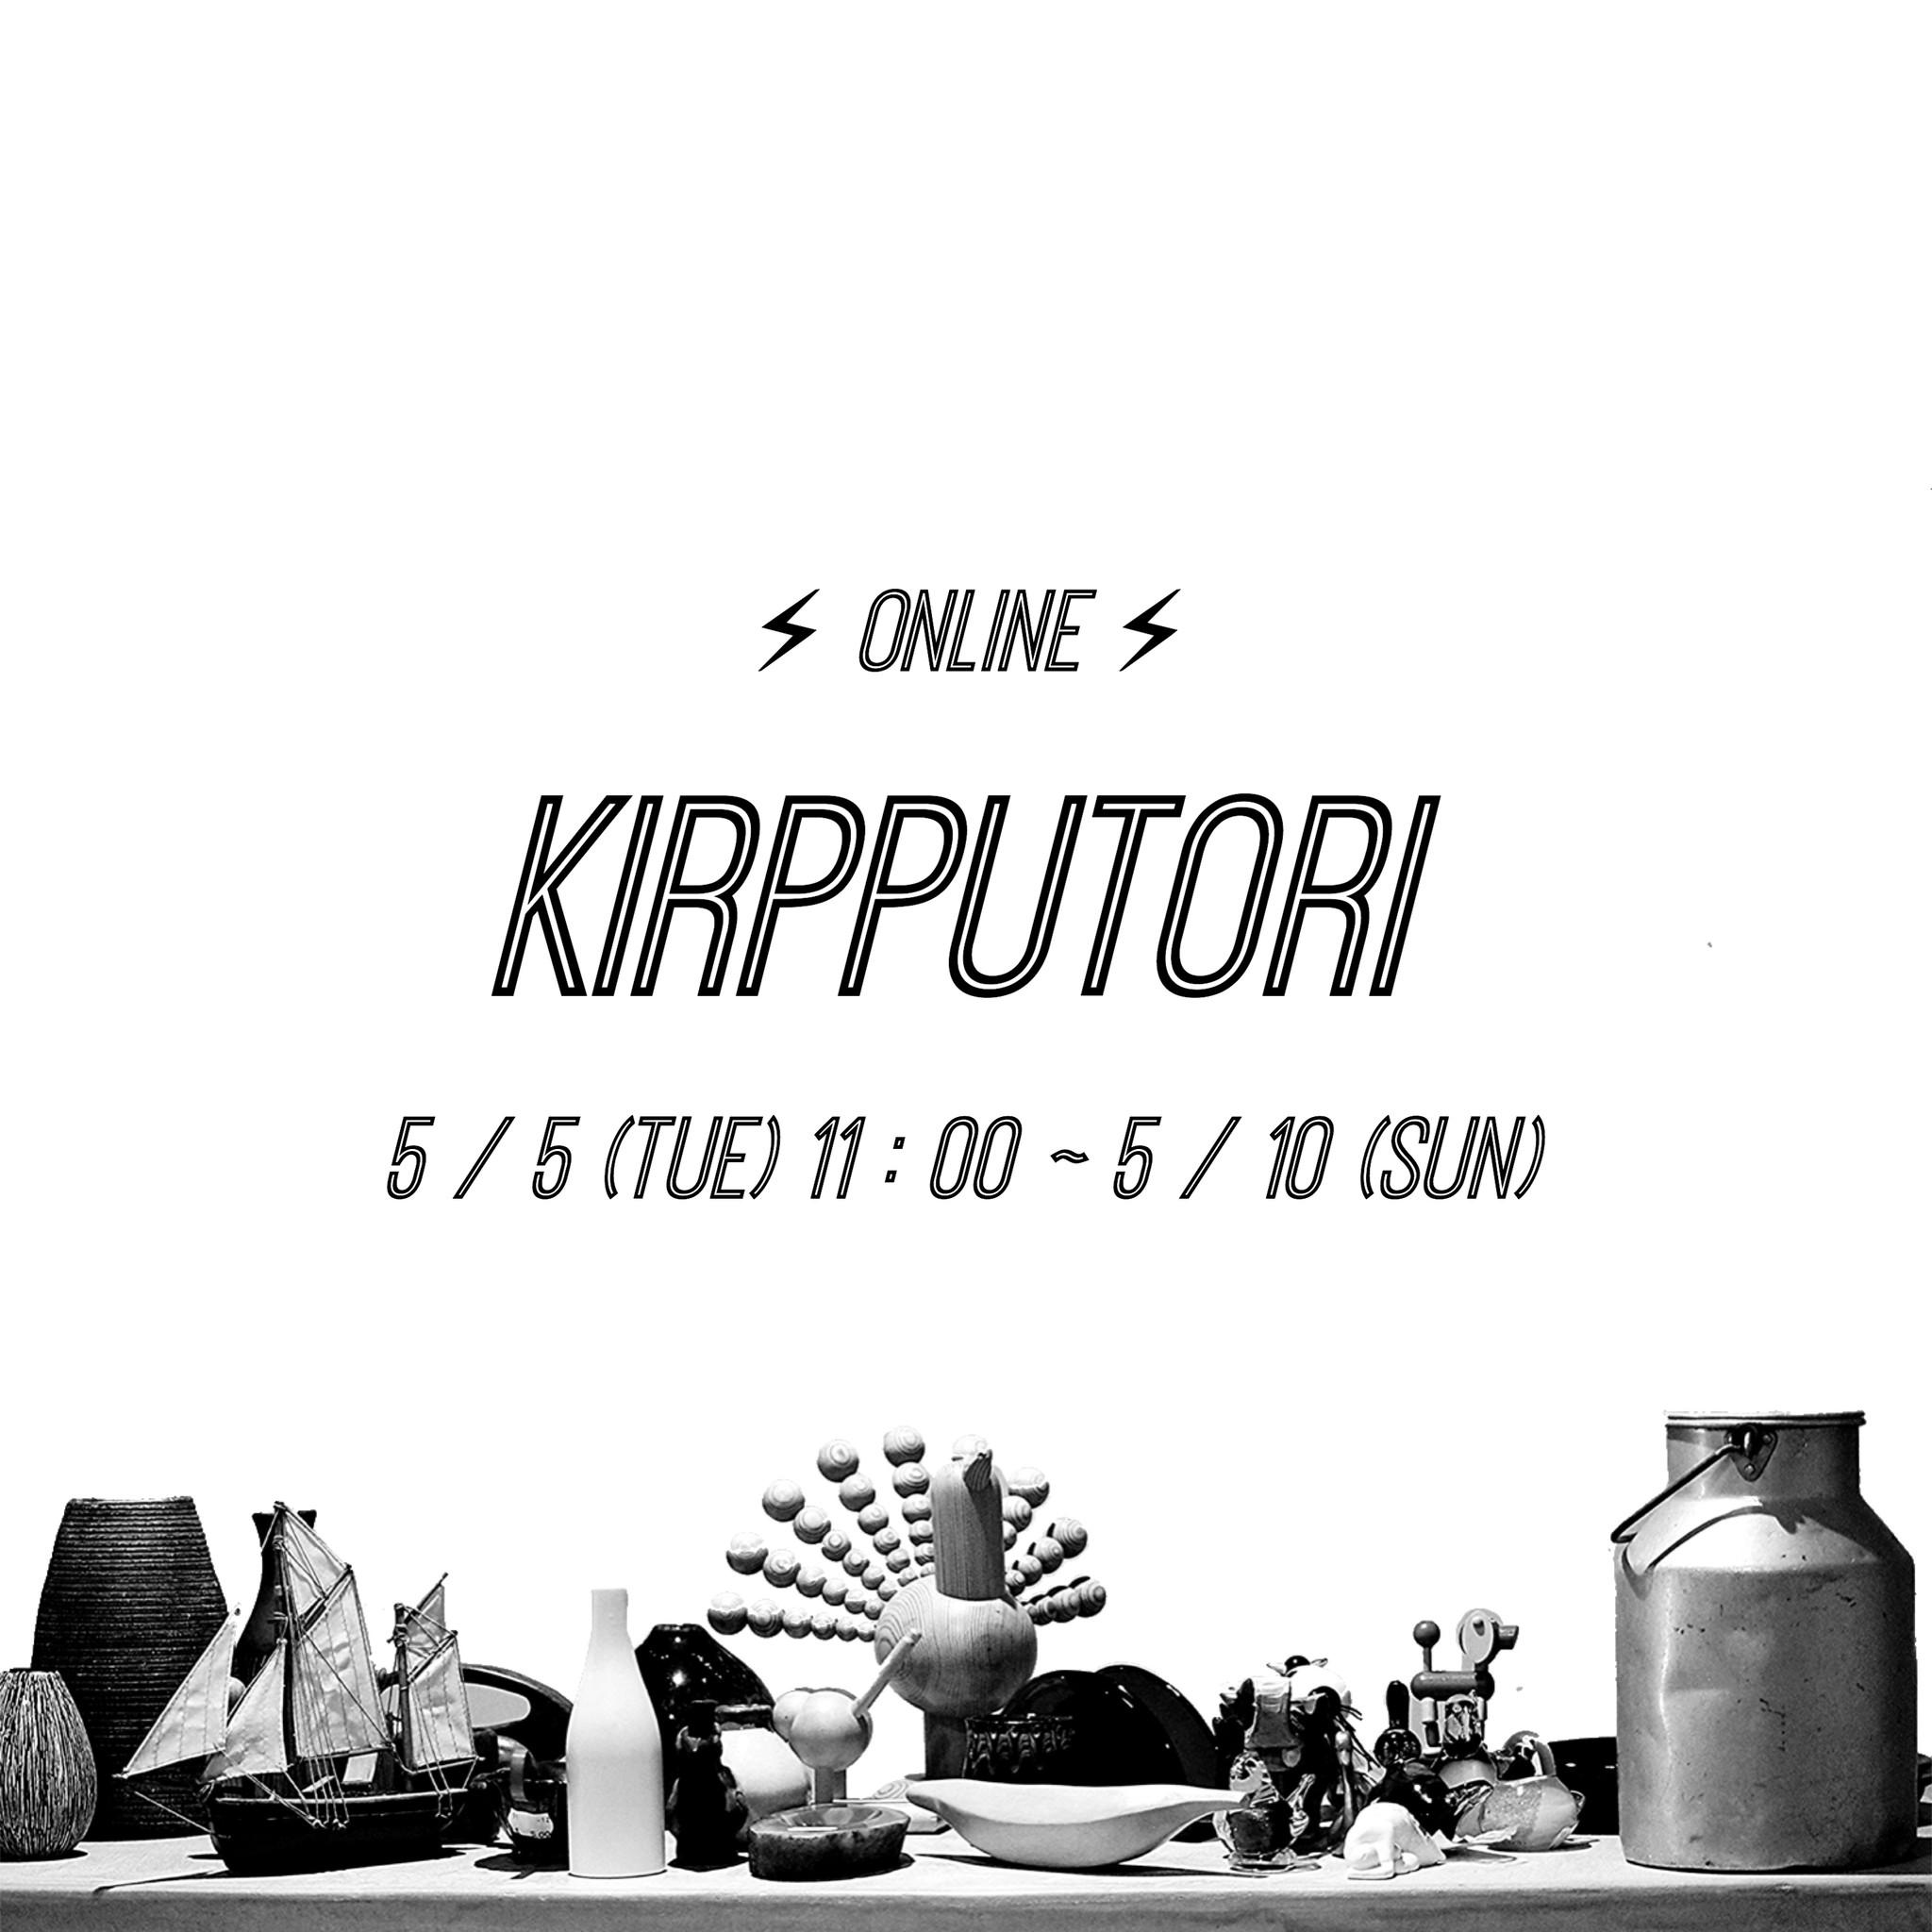 - ONLINE KIRUPPUTORI -